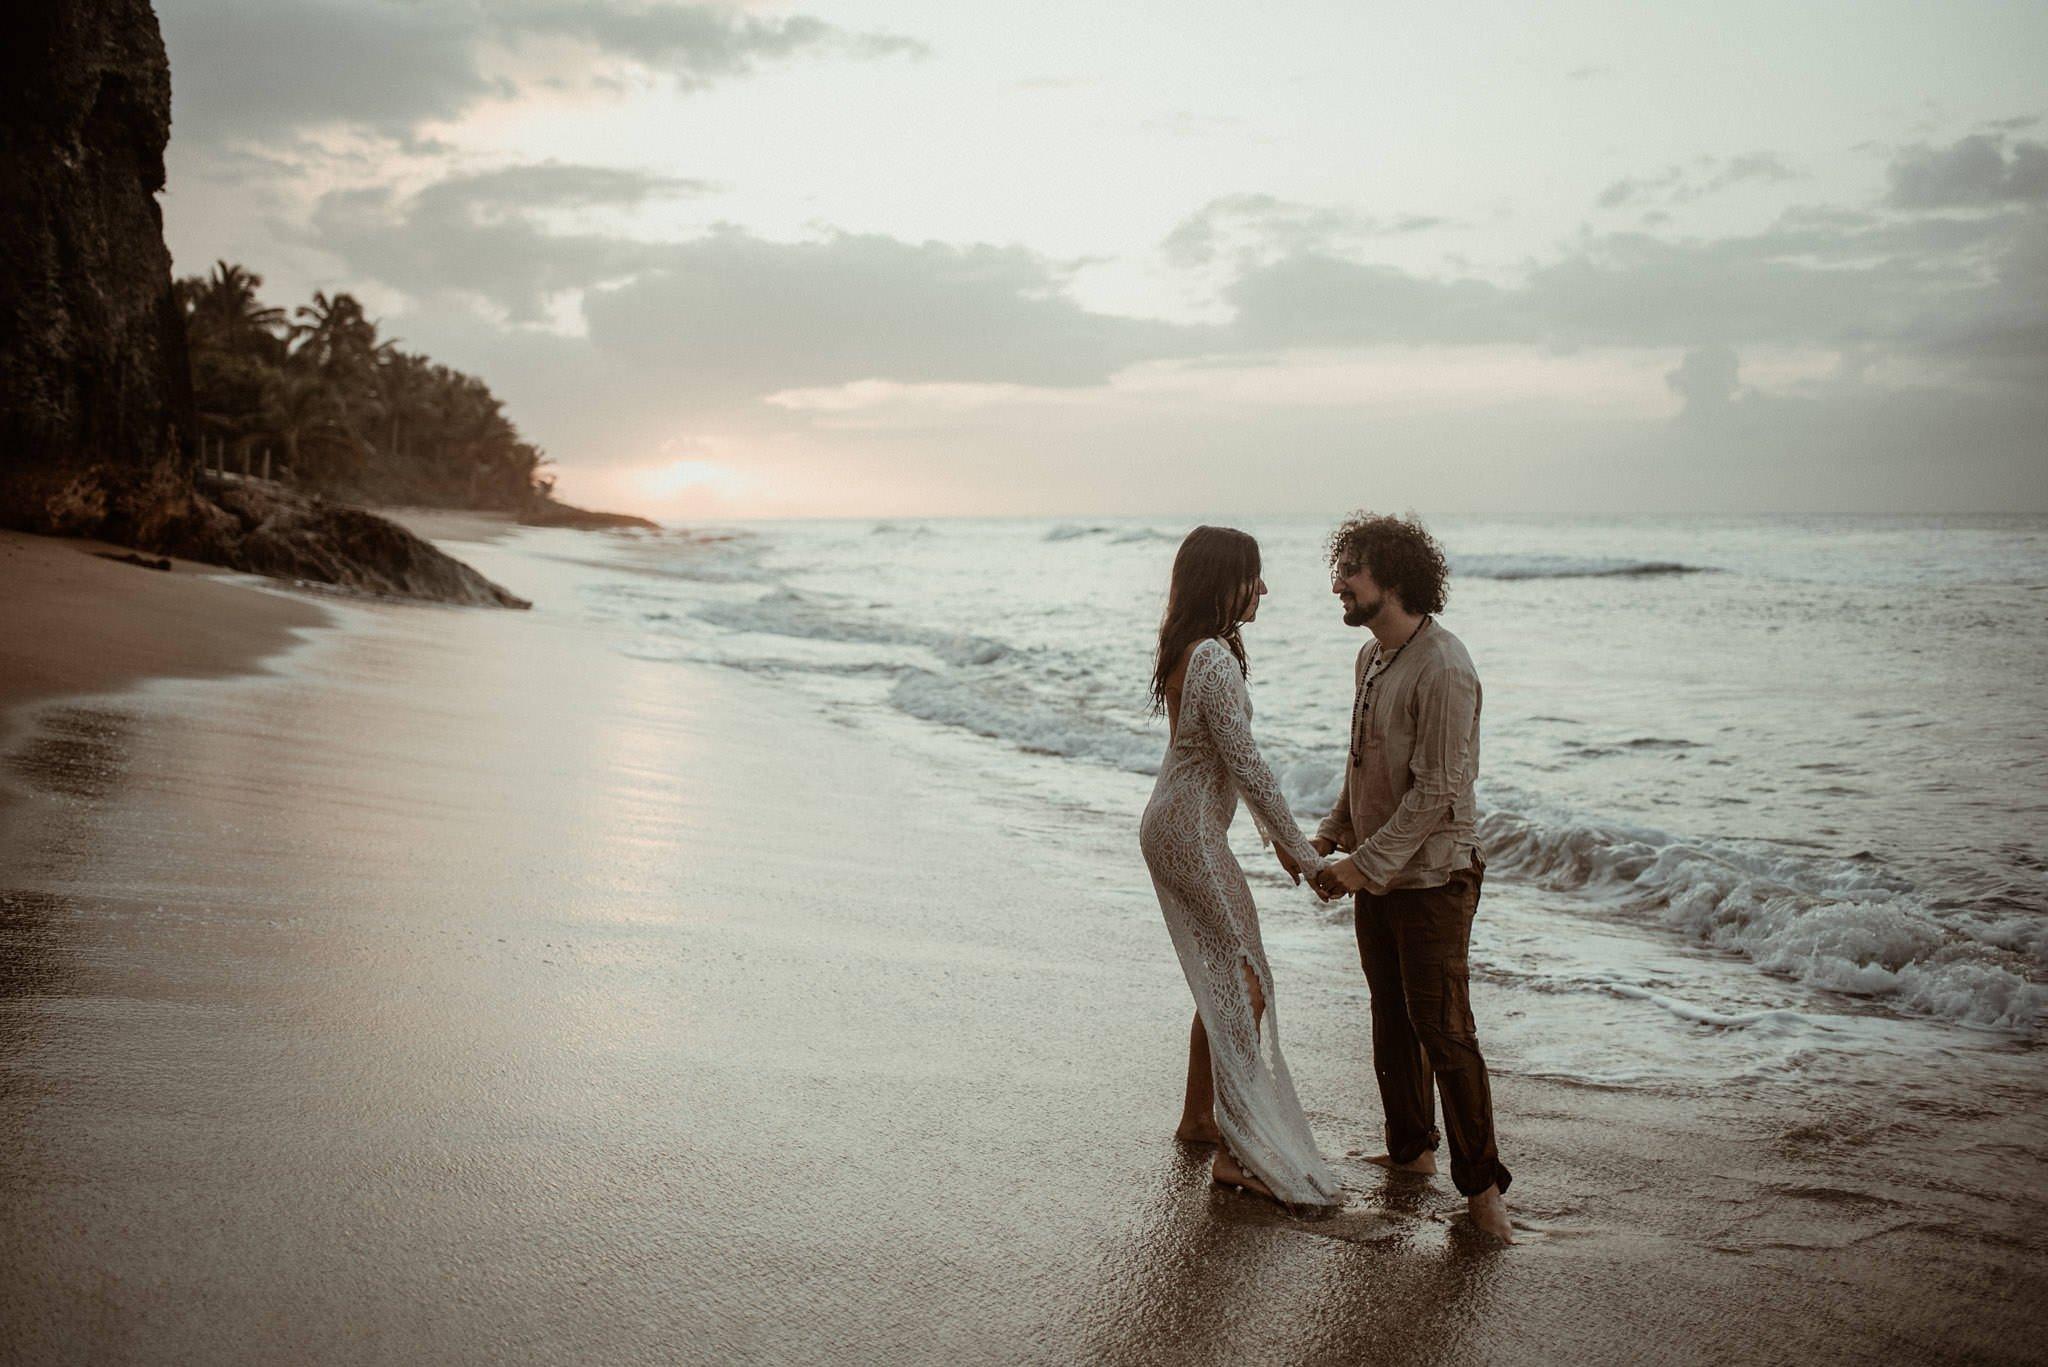 Puerto-Rico-Elopement_Lume-Photography-79.jpg